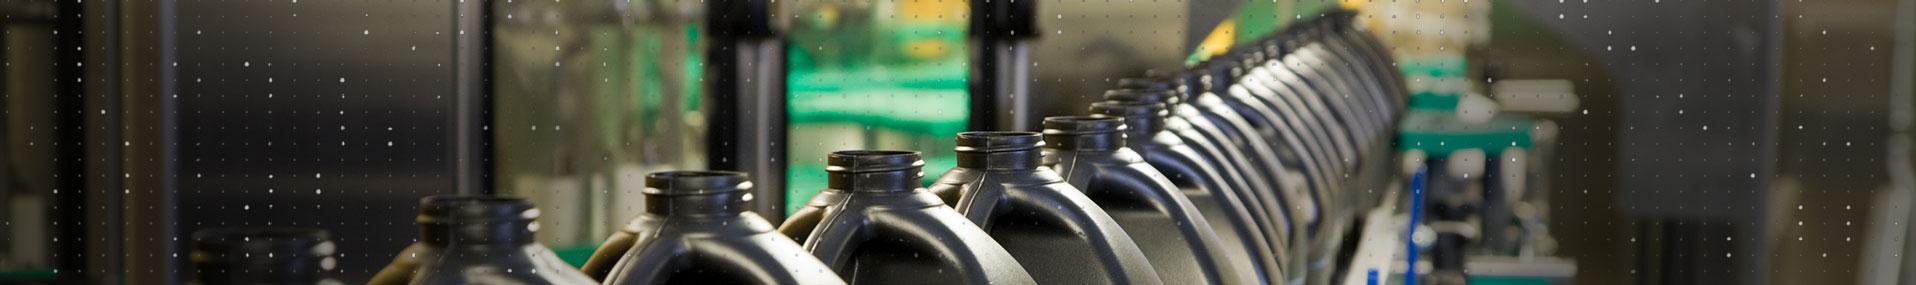 Consumer Product bottles on conveyor belt